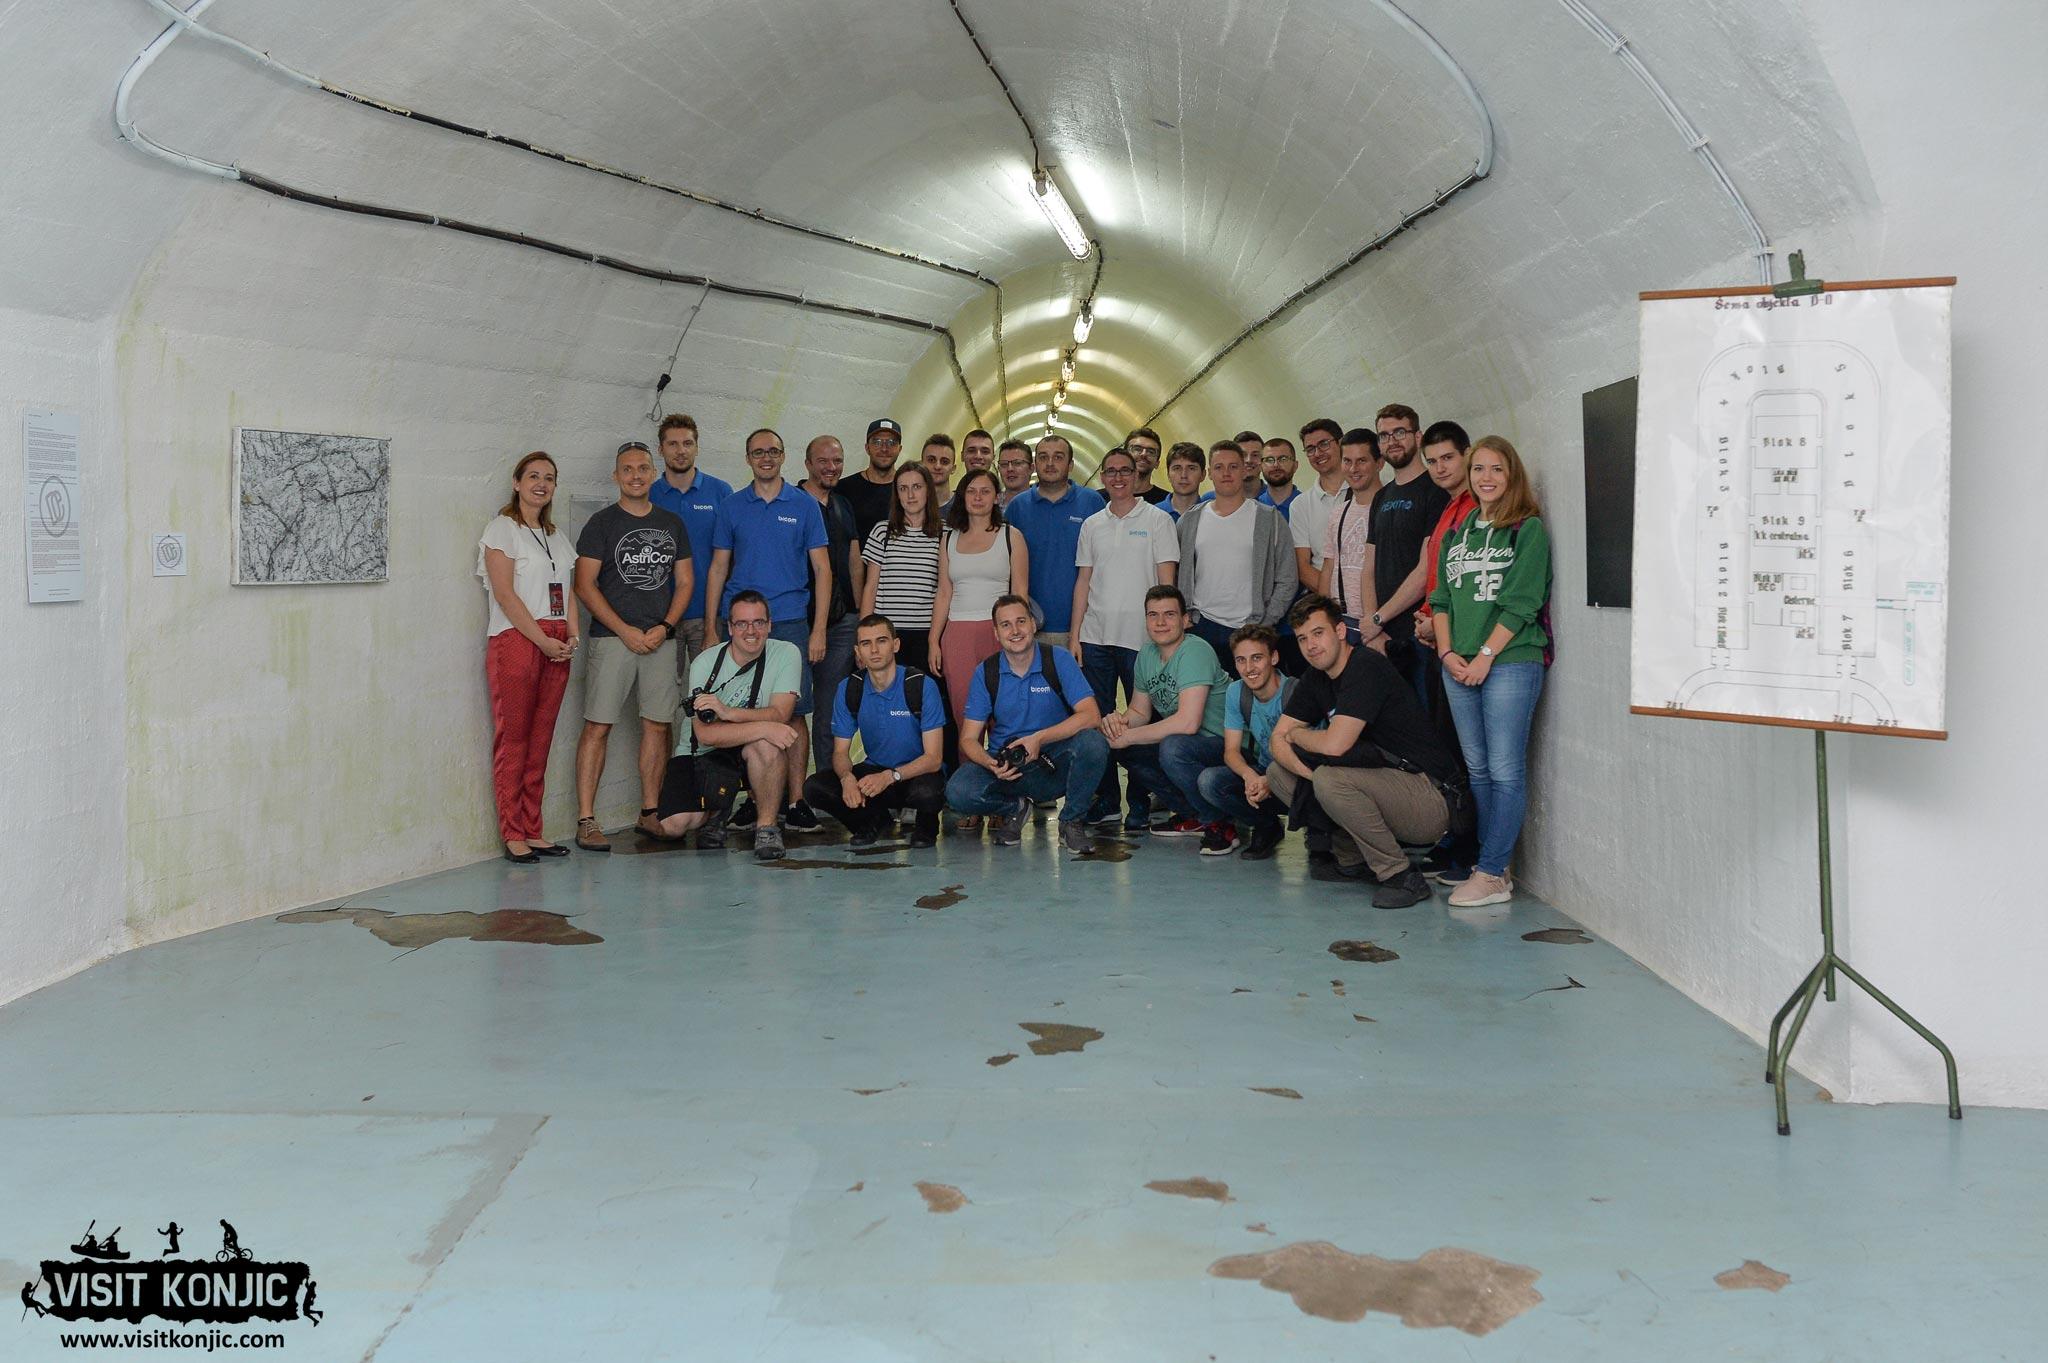 Bicom Systems at Titos Bunker